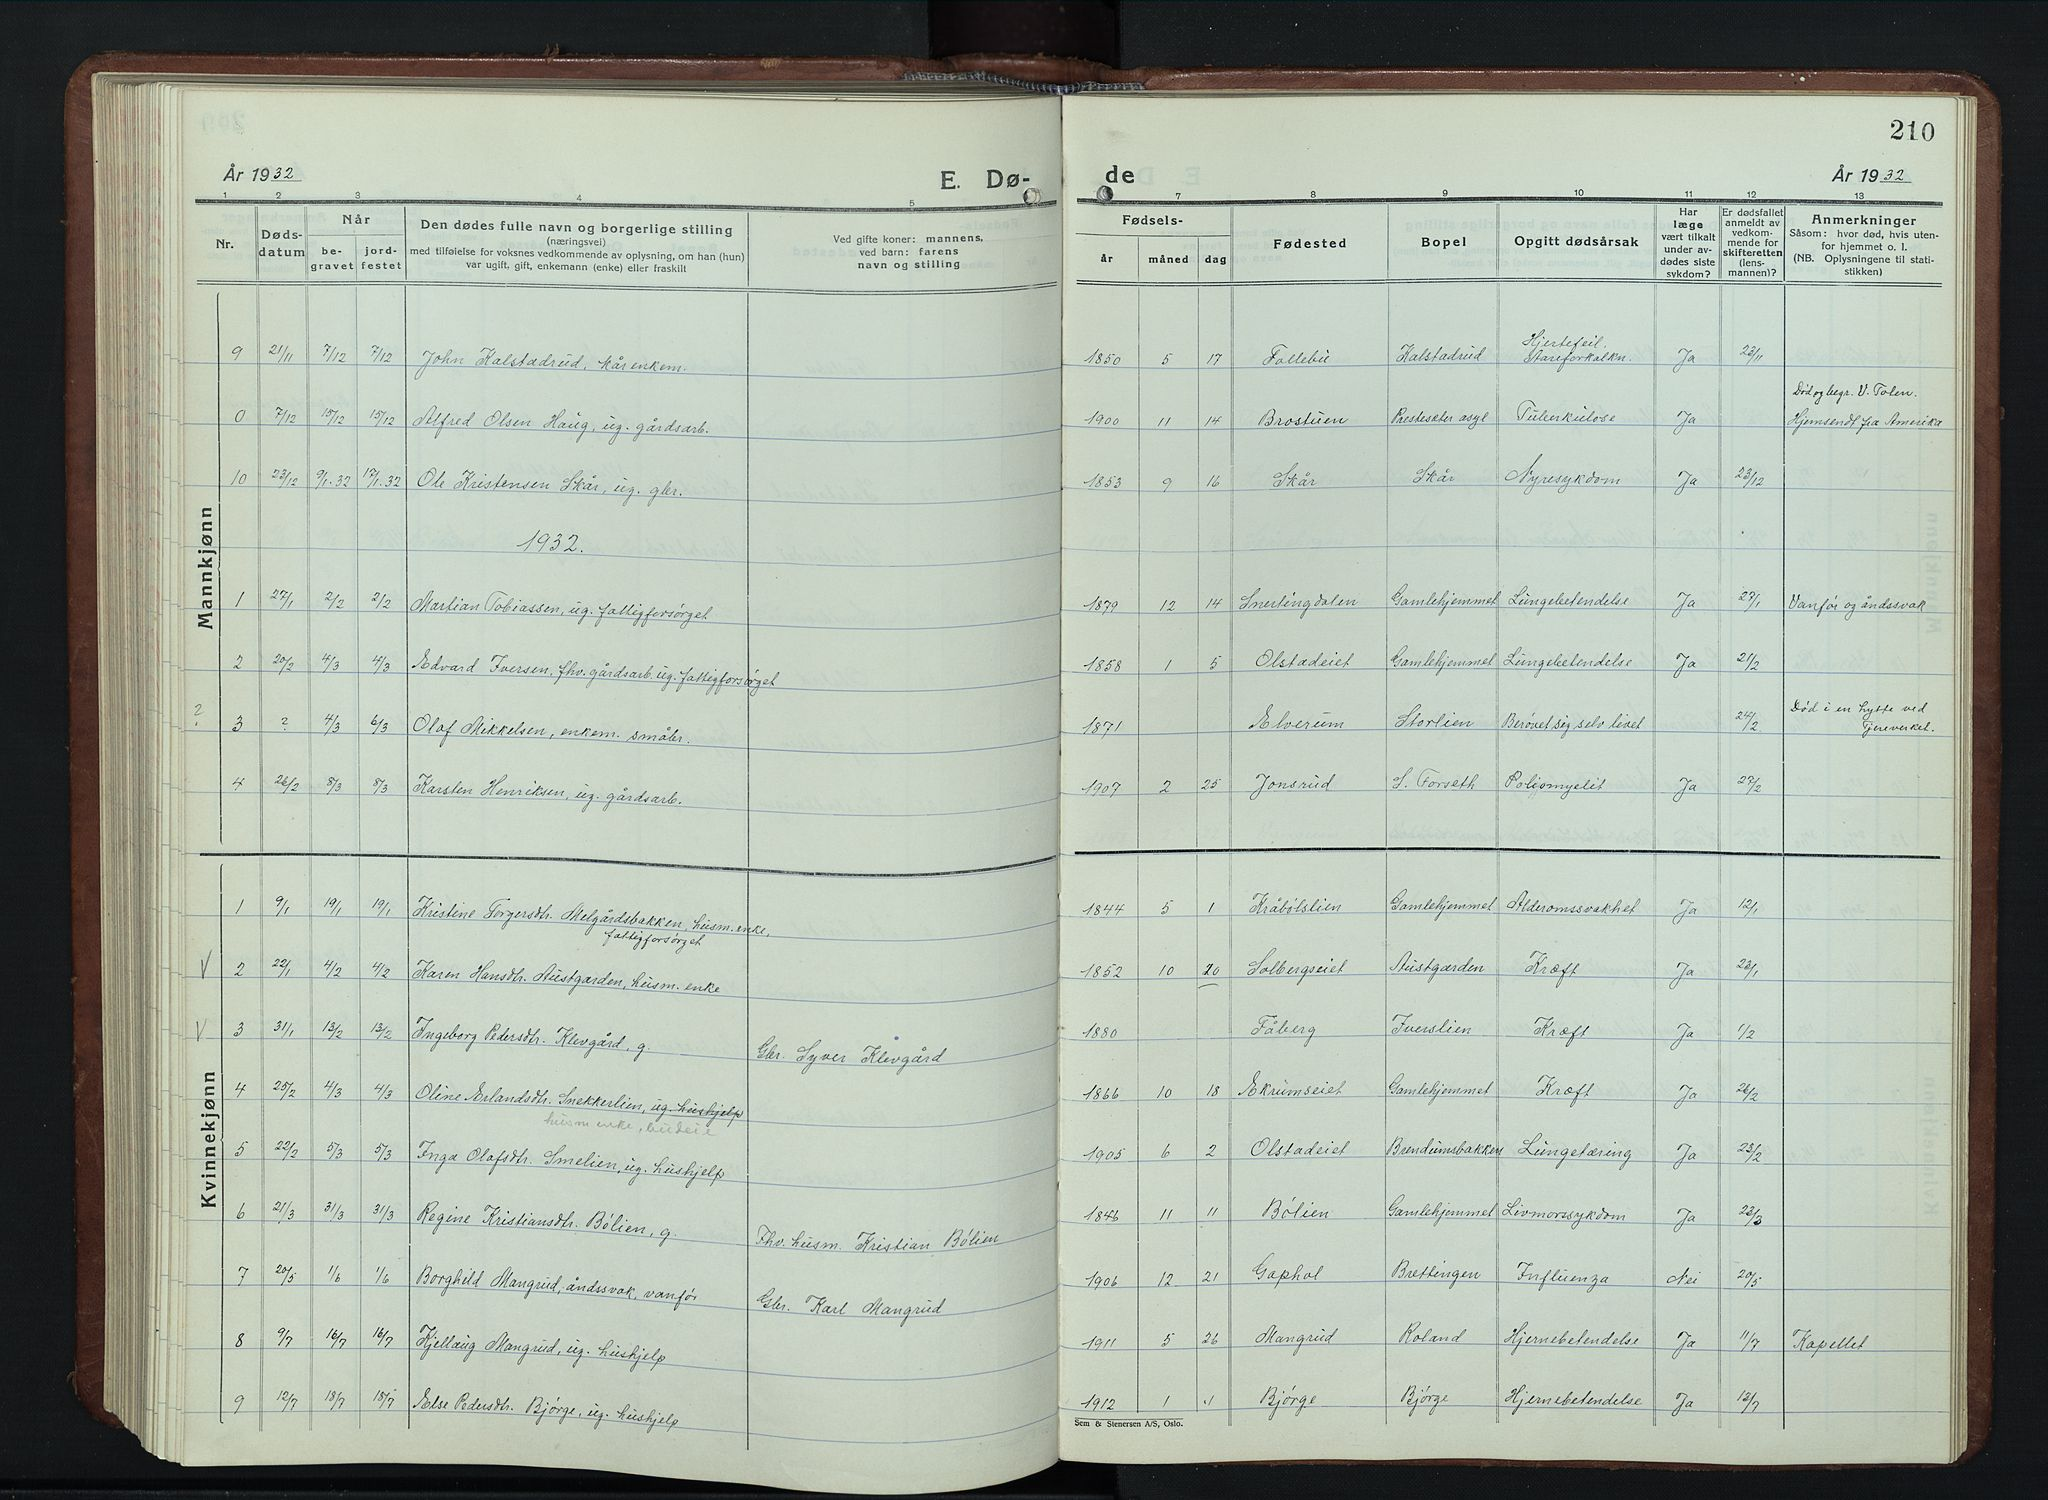 SAH, Vestre Gausdal prestekontor, Klokkerbok nr. 5, 1926-1955, s. 210